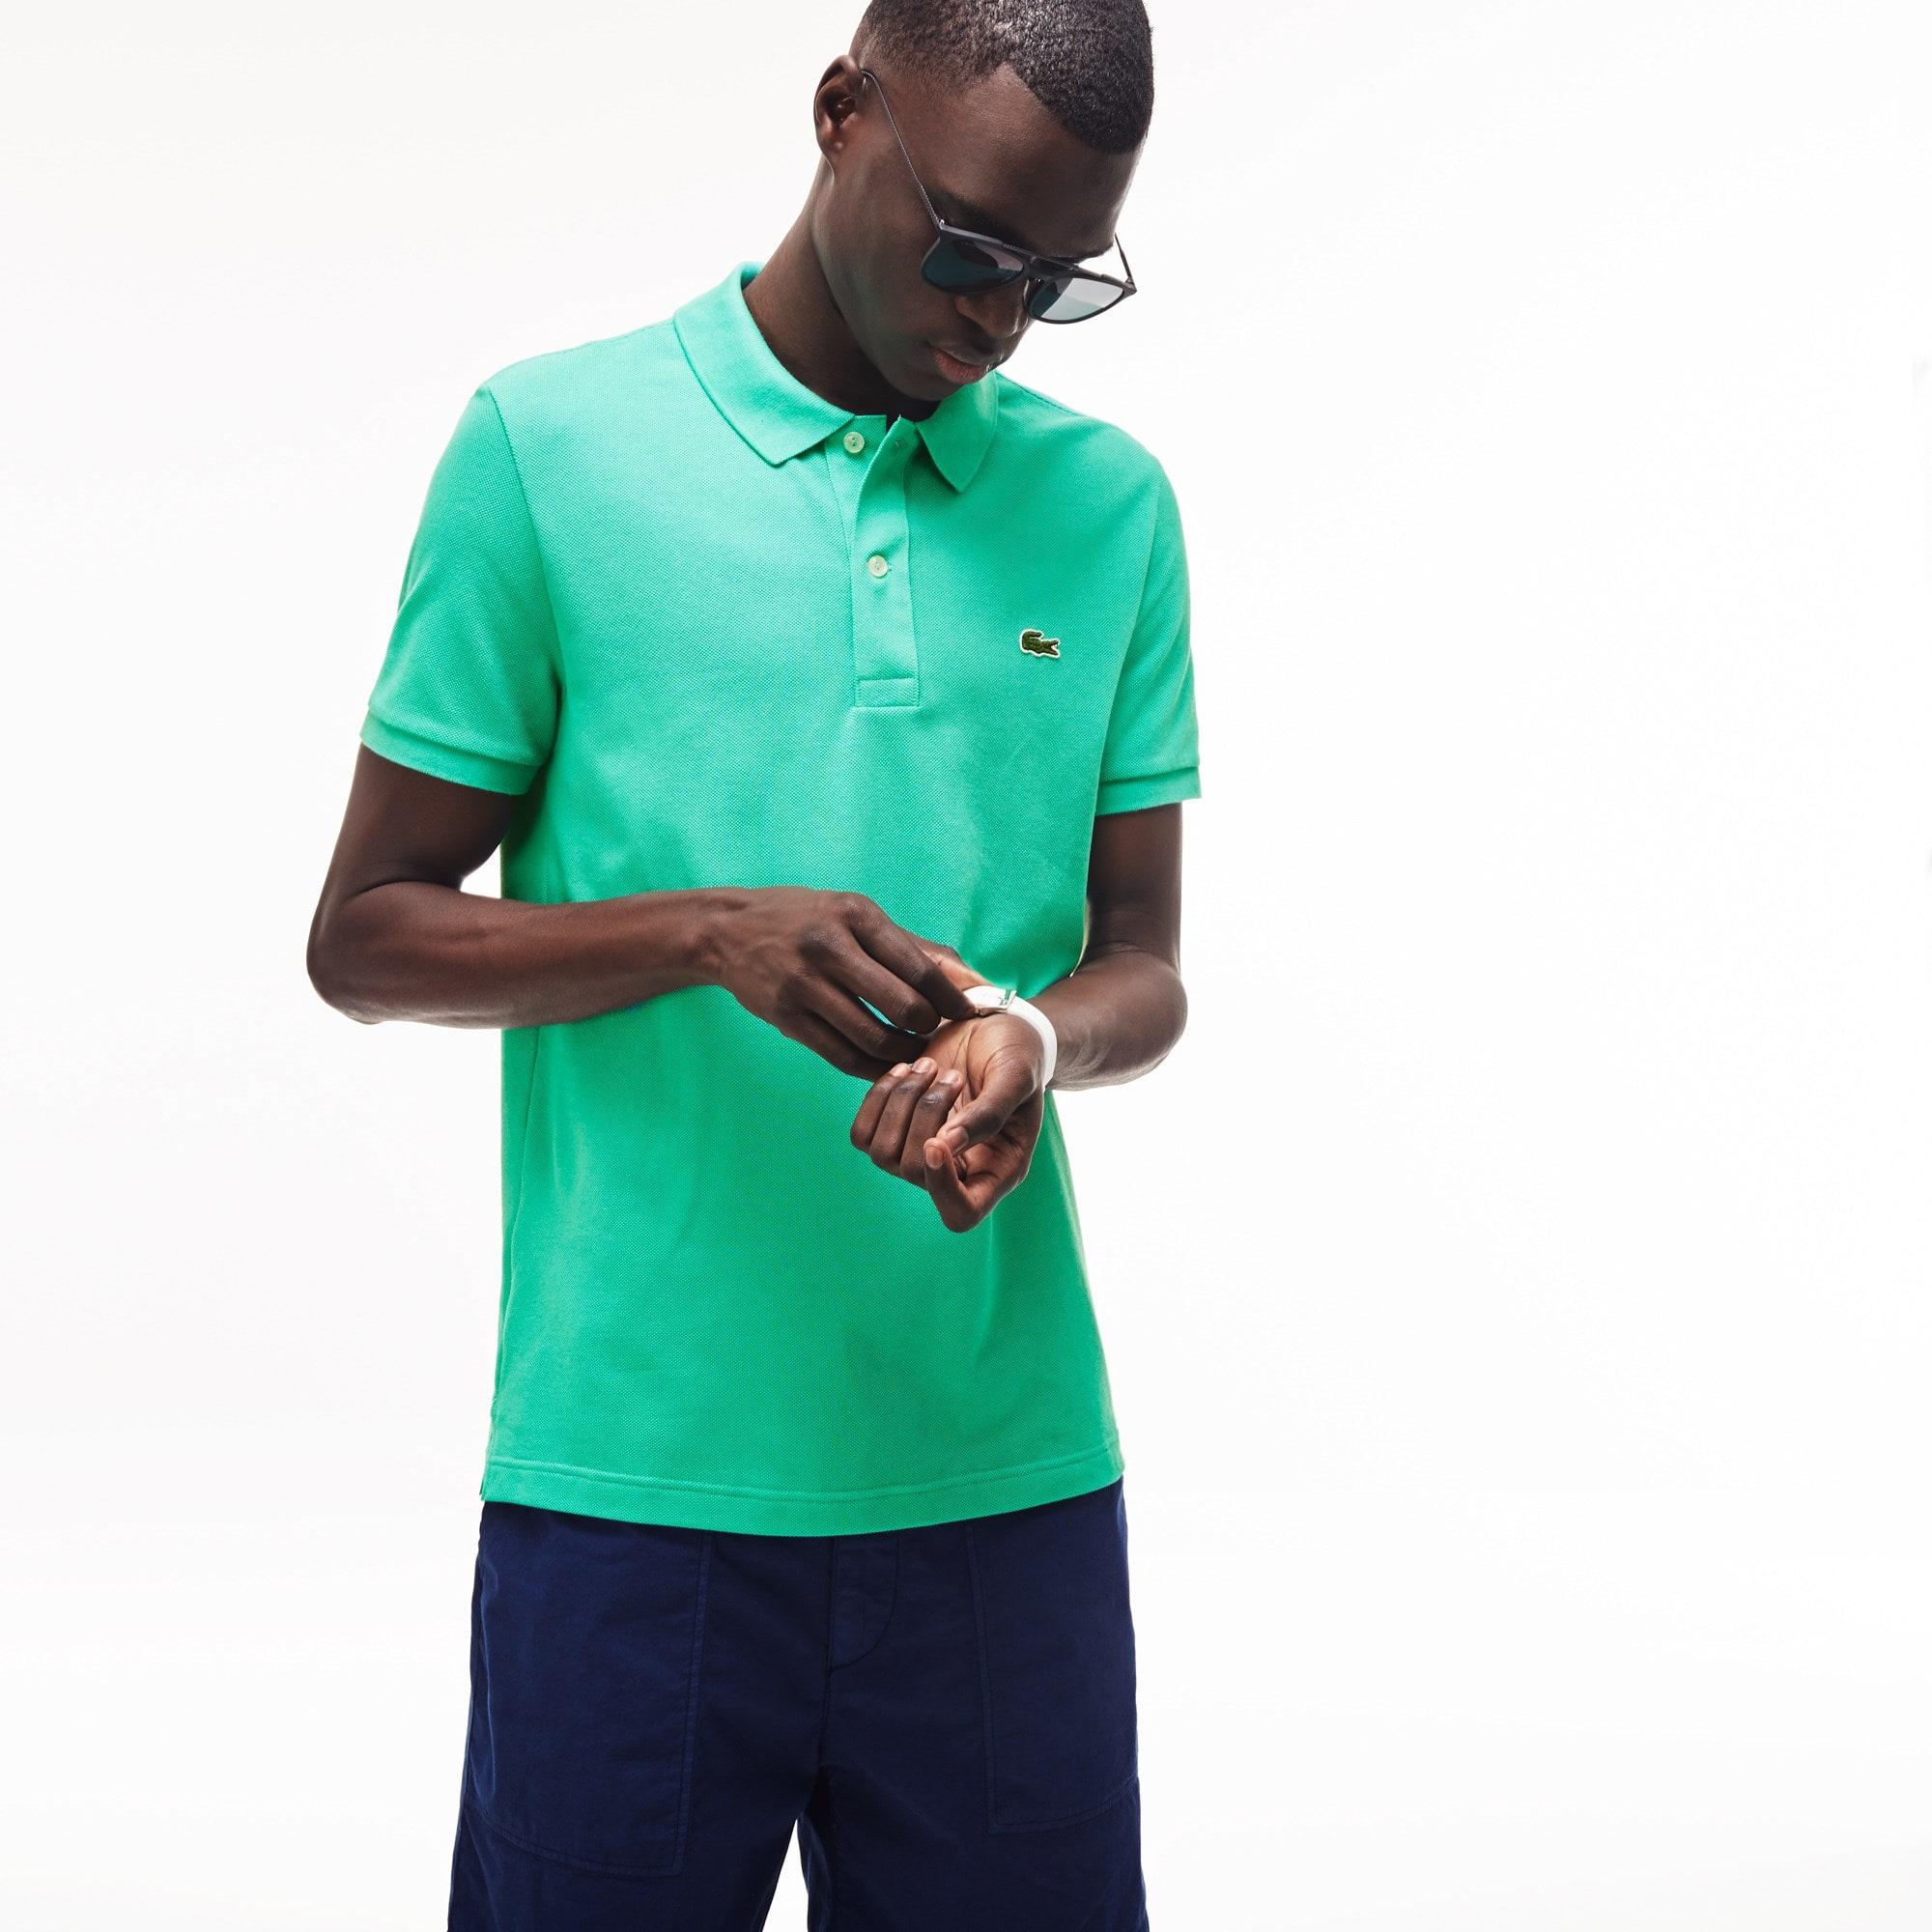 ea81f4eed Men s Slim fit Lacoste Polo Shirt in petit piqué